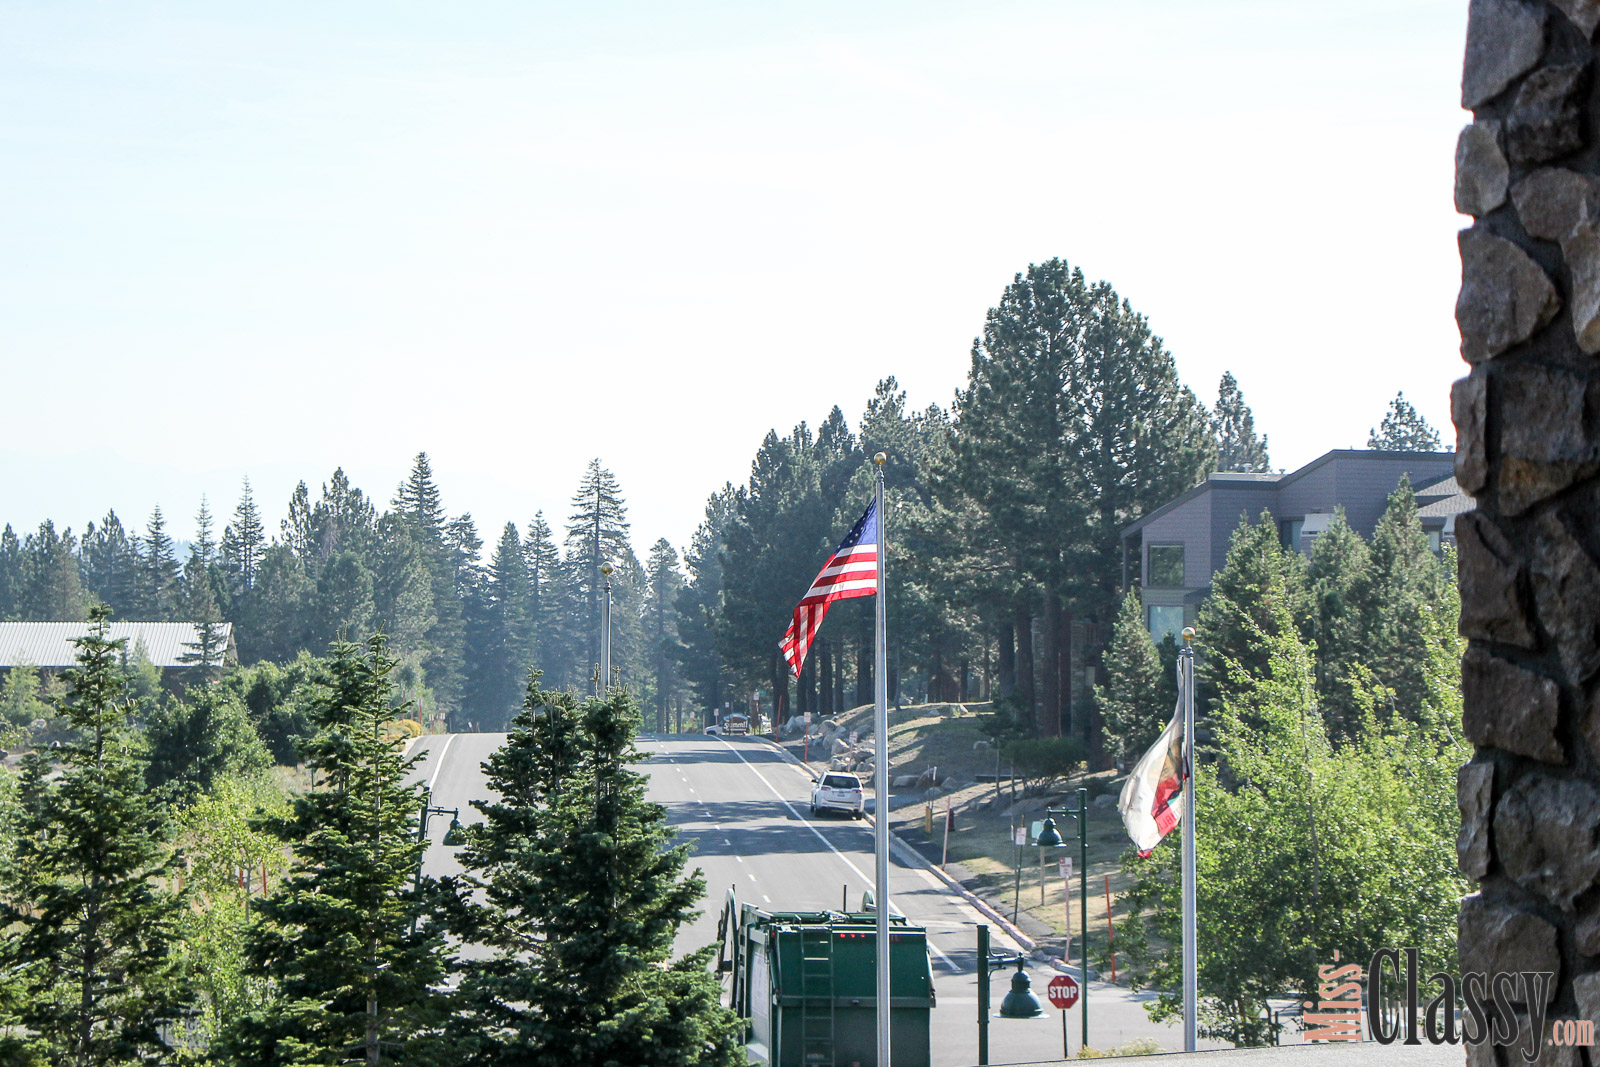 TRAVEL Yosemite Nationalpark, Miss Classy, miss-classy.com, Lifestyleblog, Lifestyleblogger, Lifestyleblog Graz, Travelblog, Travelblogger, Graz, Steiermark, Österreich, classy, beclassy, Reise, Travel, Wanderlust, Wayfarer, USA, Westküste, Roadtrip, California, Kalifornien, Yosemite, Yosemite Nationalpark, Mammoth Lakes, Juniper Springs Resort, Tioga Pass, Tioga Pass Road, Ellery Lake, Tuolumne Meadows, Tenaya Lake, Olmsted Point, Half Dome